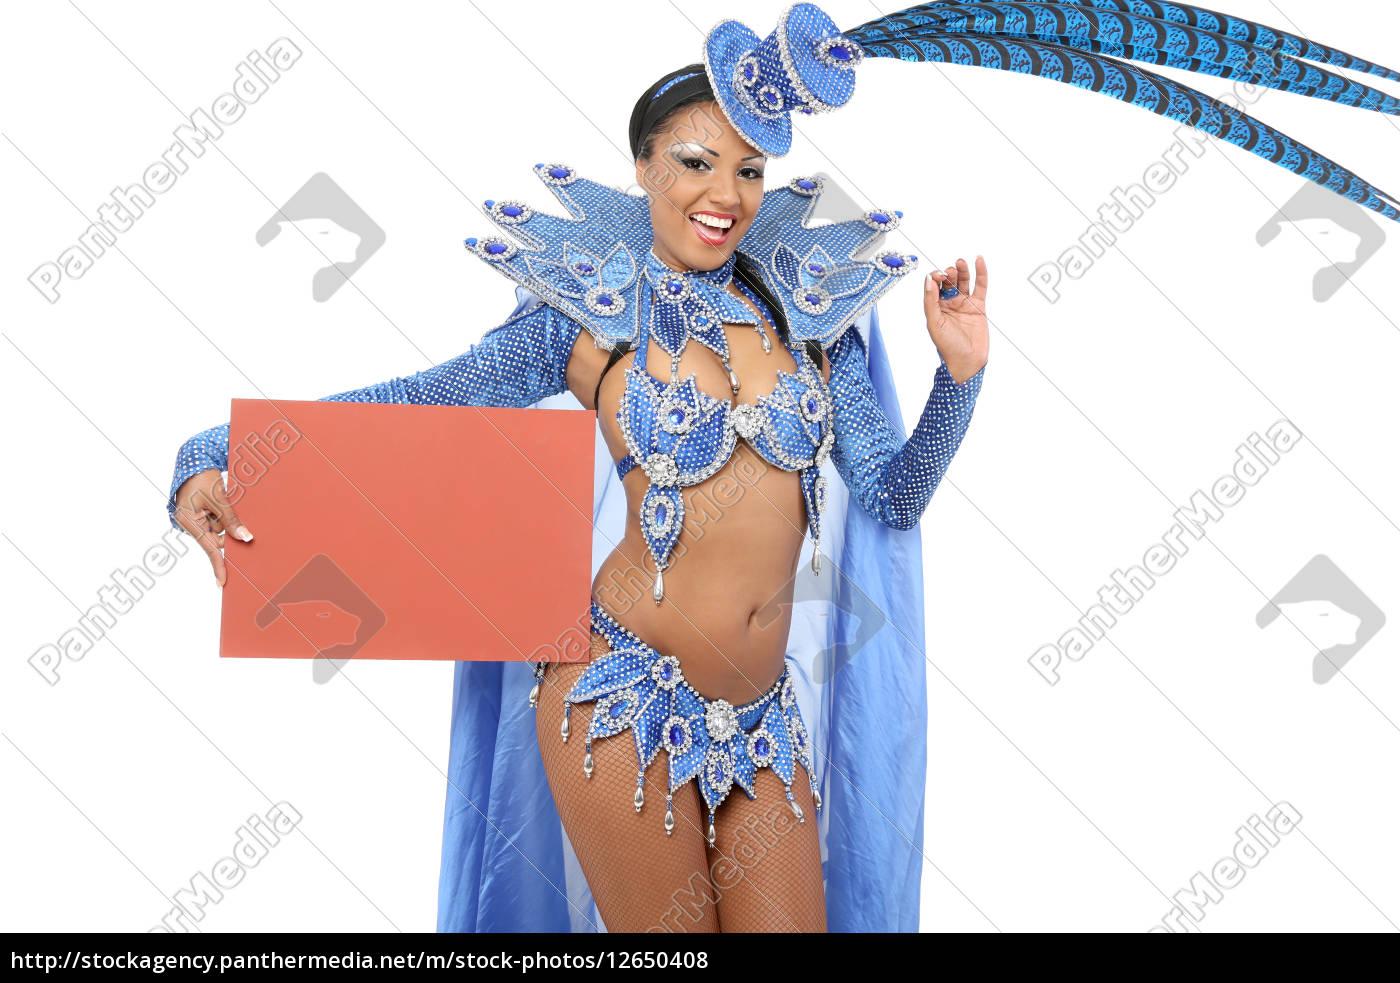 dançarino, de, samba, brasileiro - 12650408